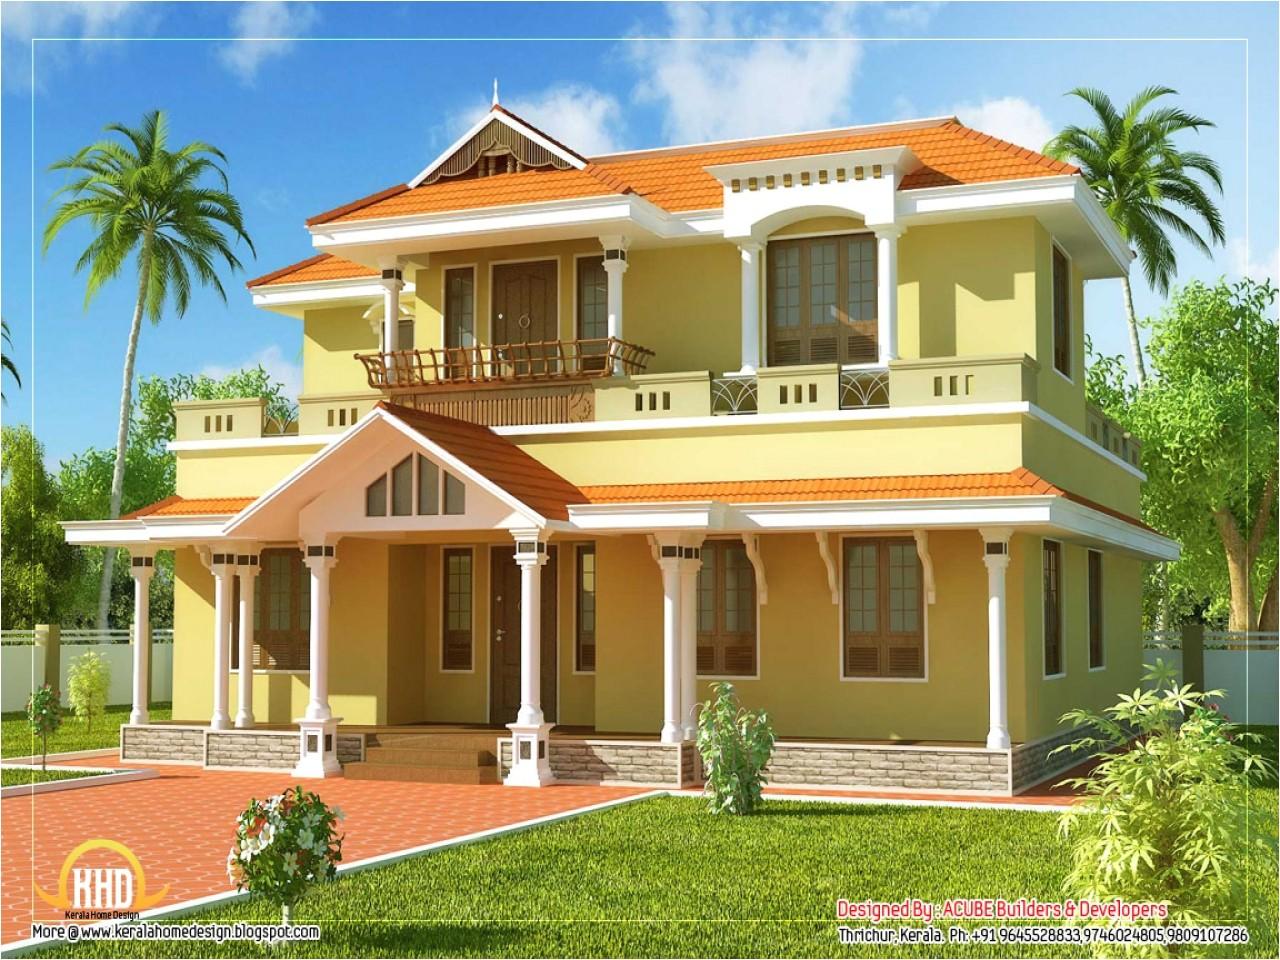 4ed46099c39500c8 kerala model house plans designs vastu house plans kerala